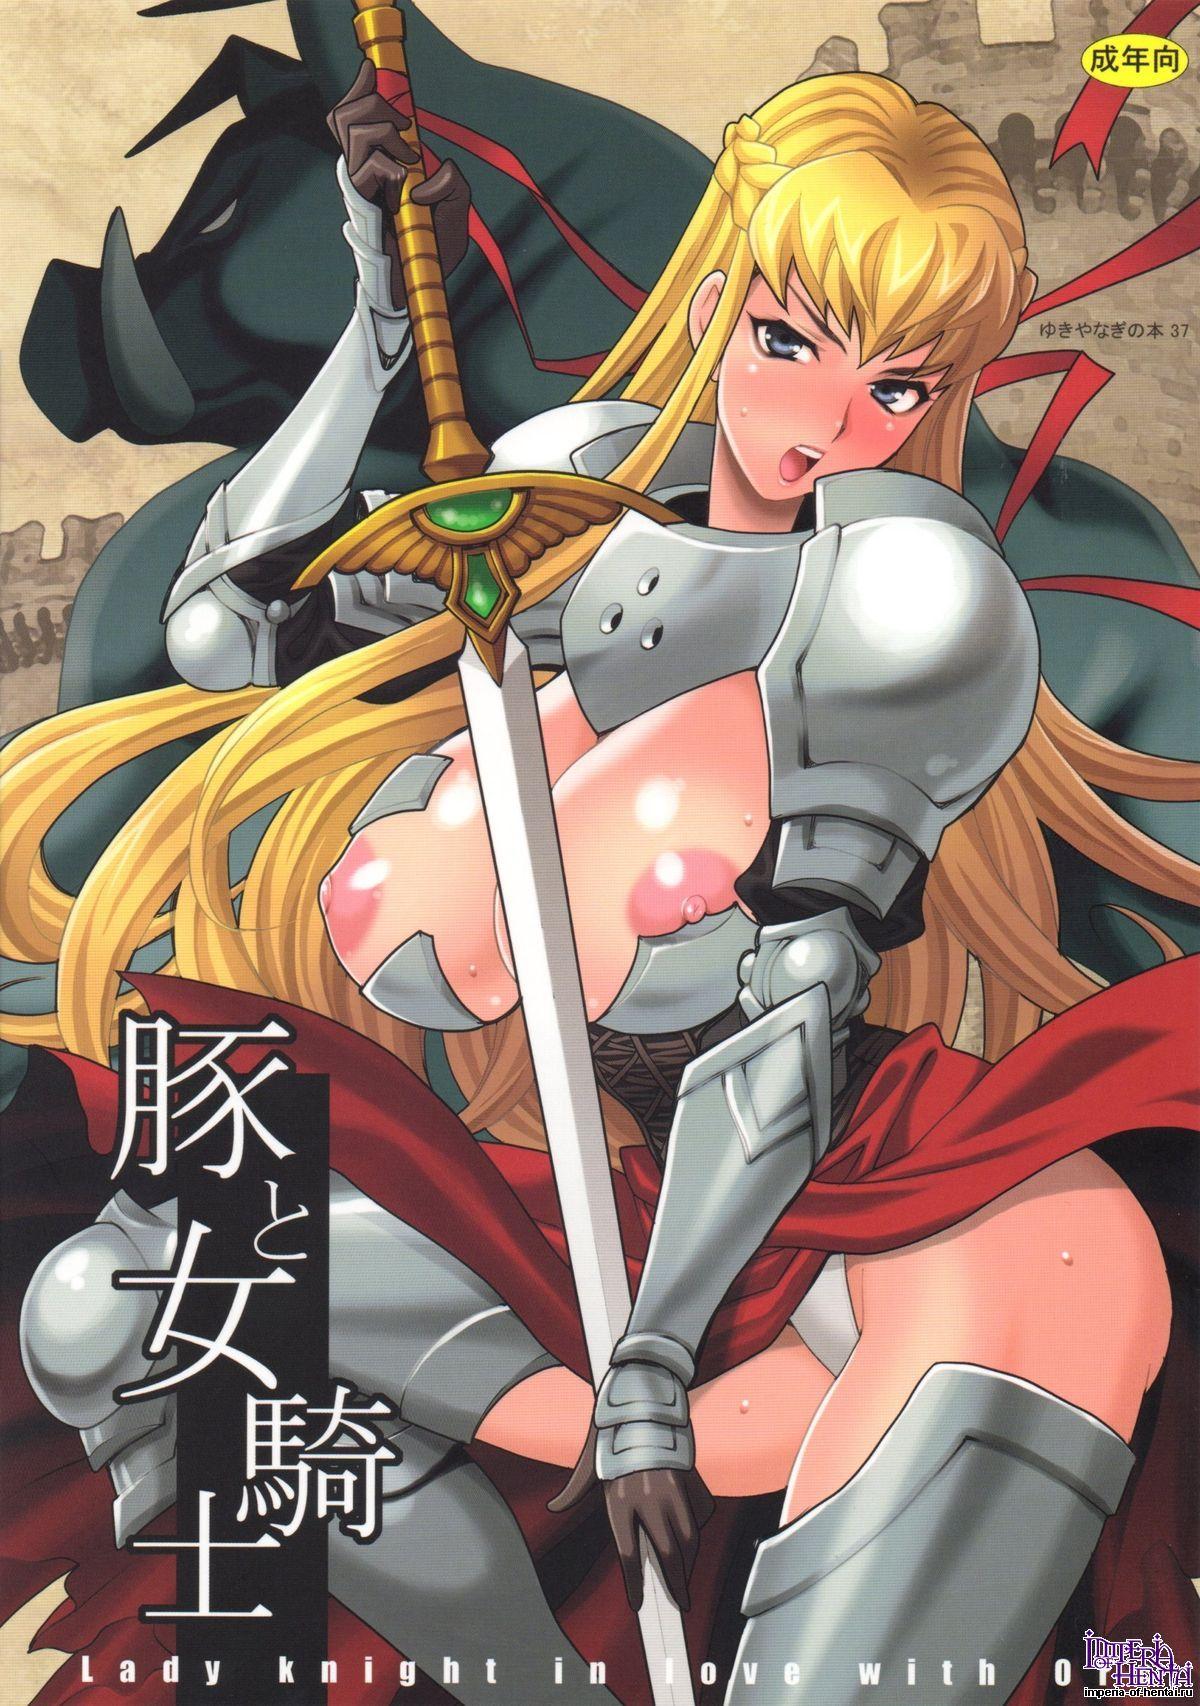 Lady knight sex